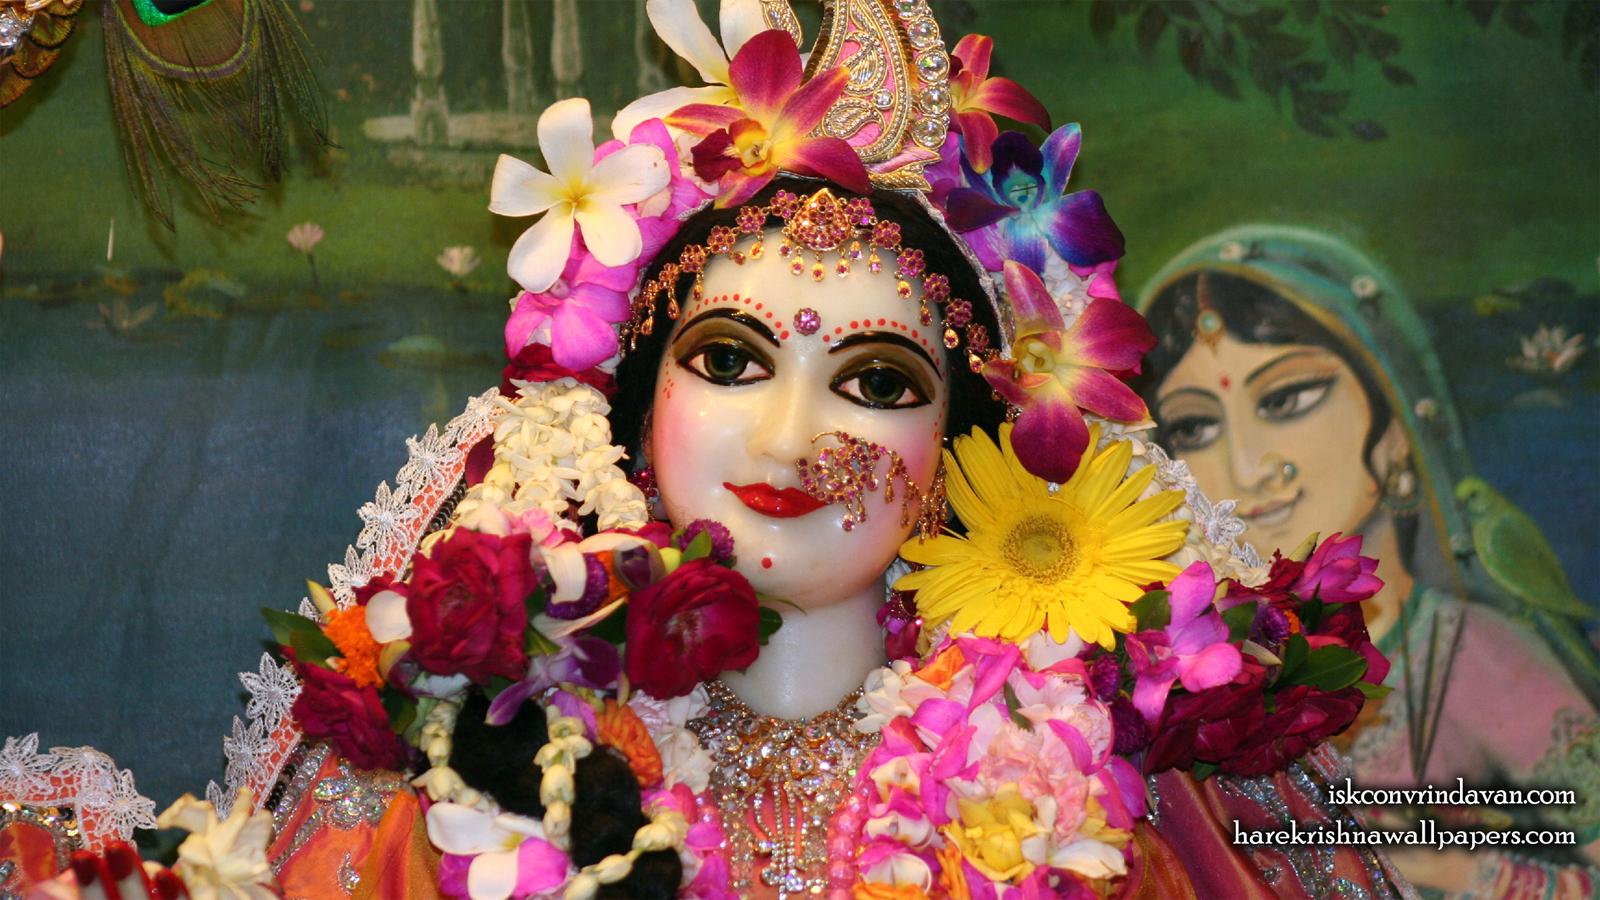 Sri Radha Close up Wallpaper (022) Size 1600x900 Download